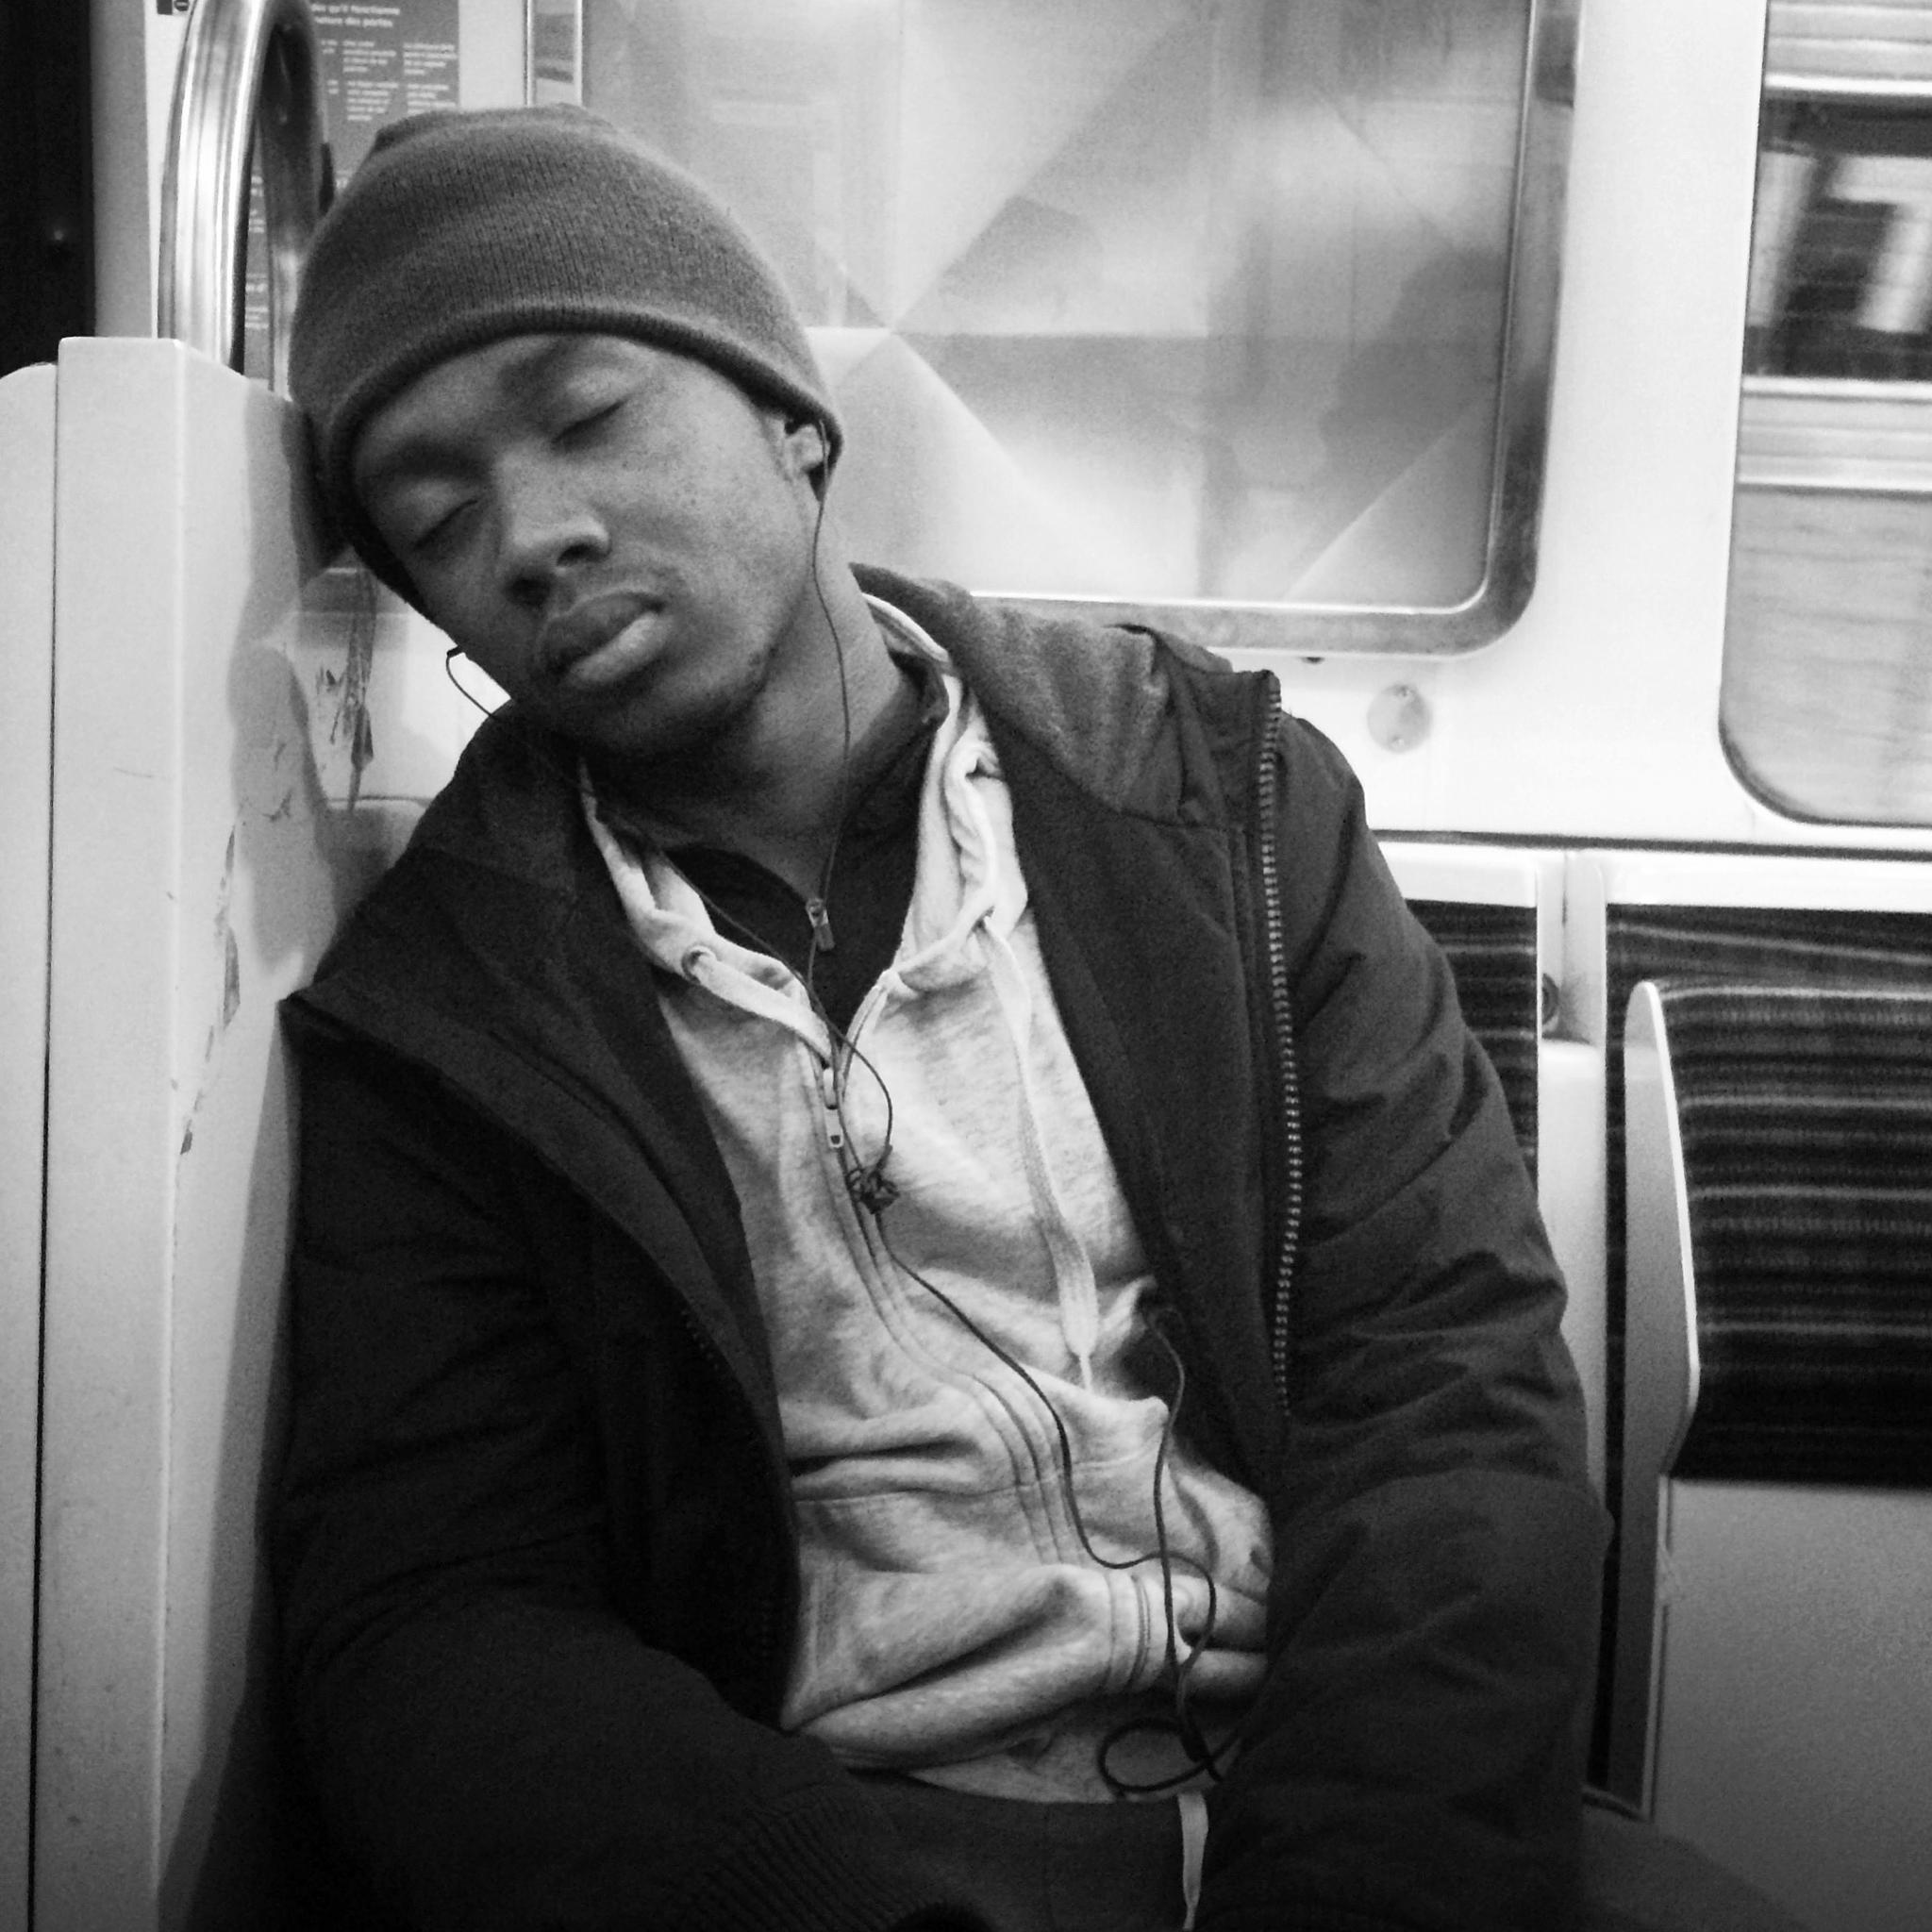 Nap on the Paris Metro by parisfind